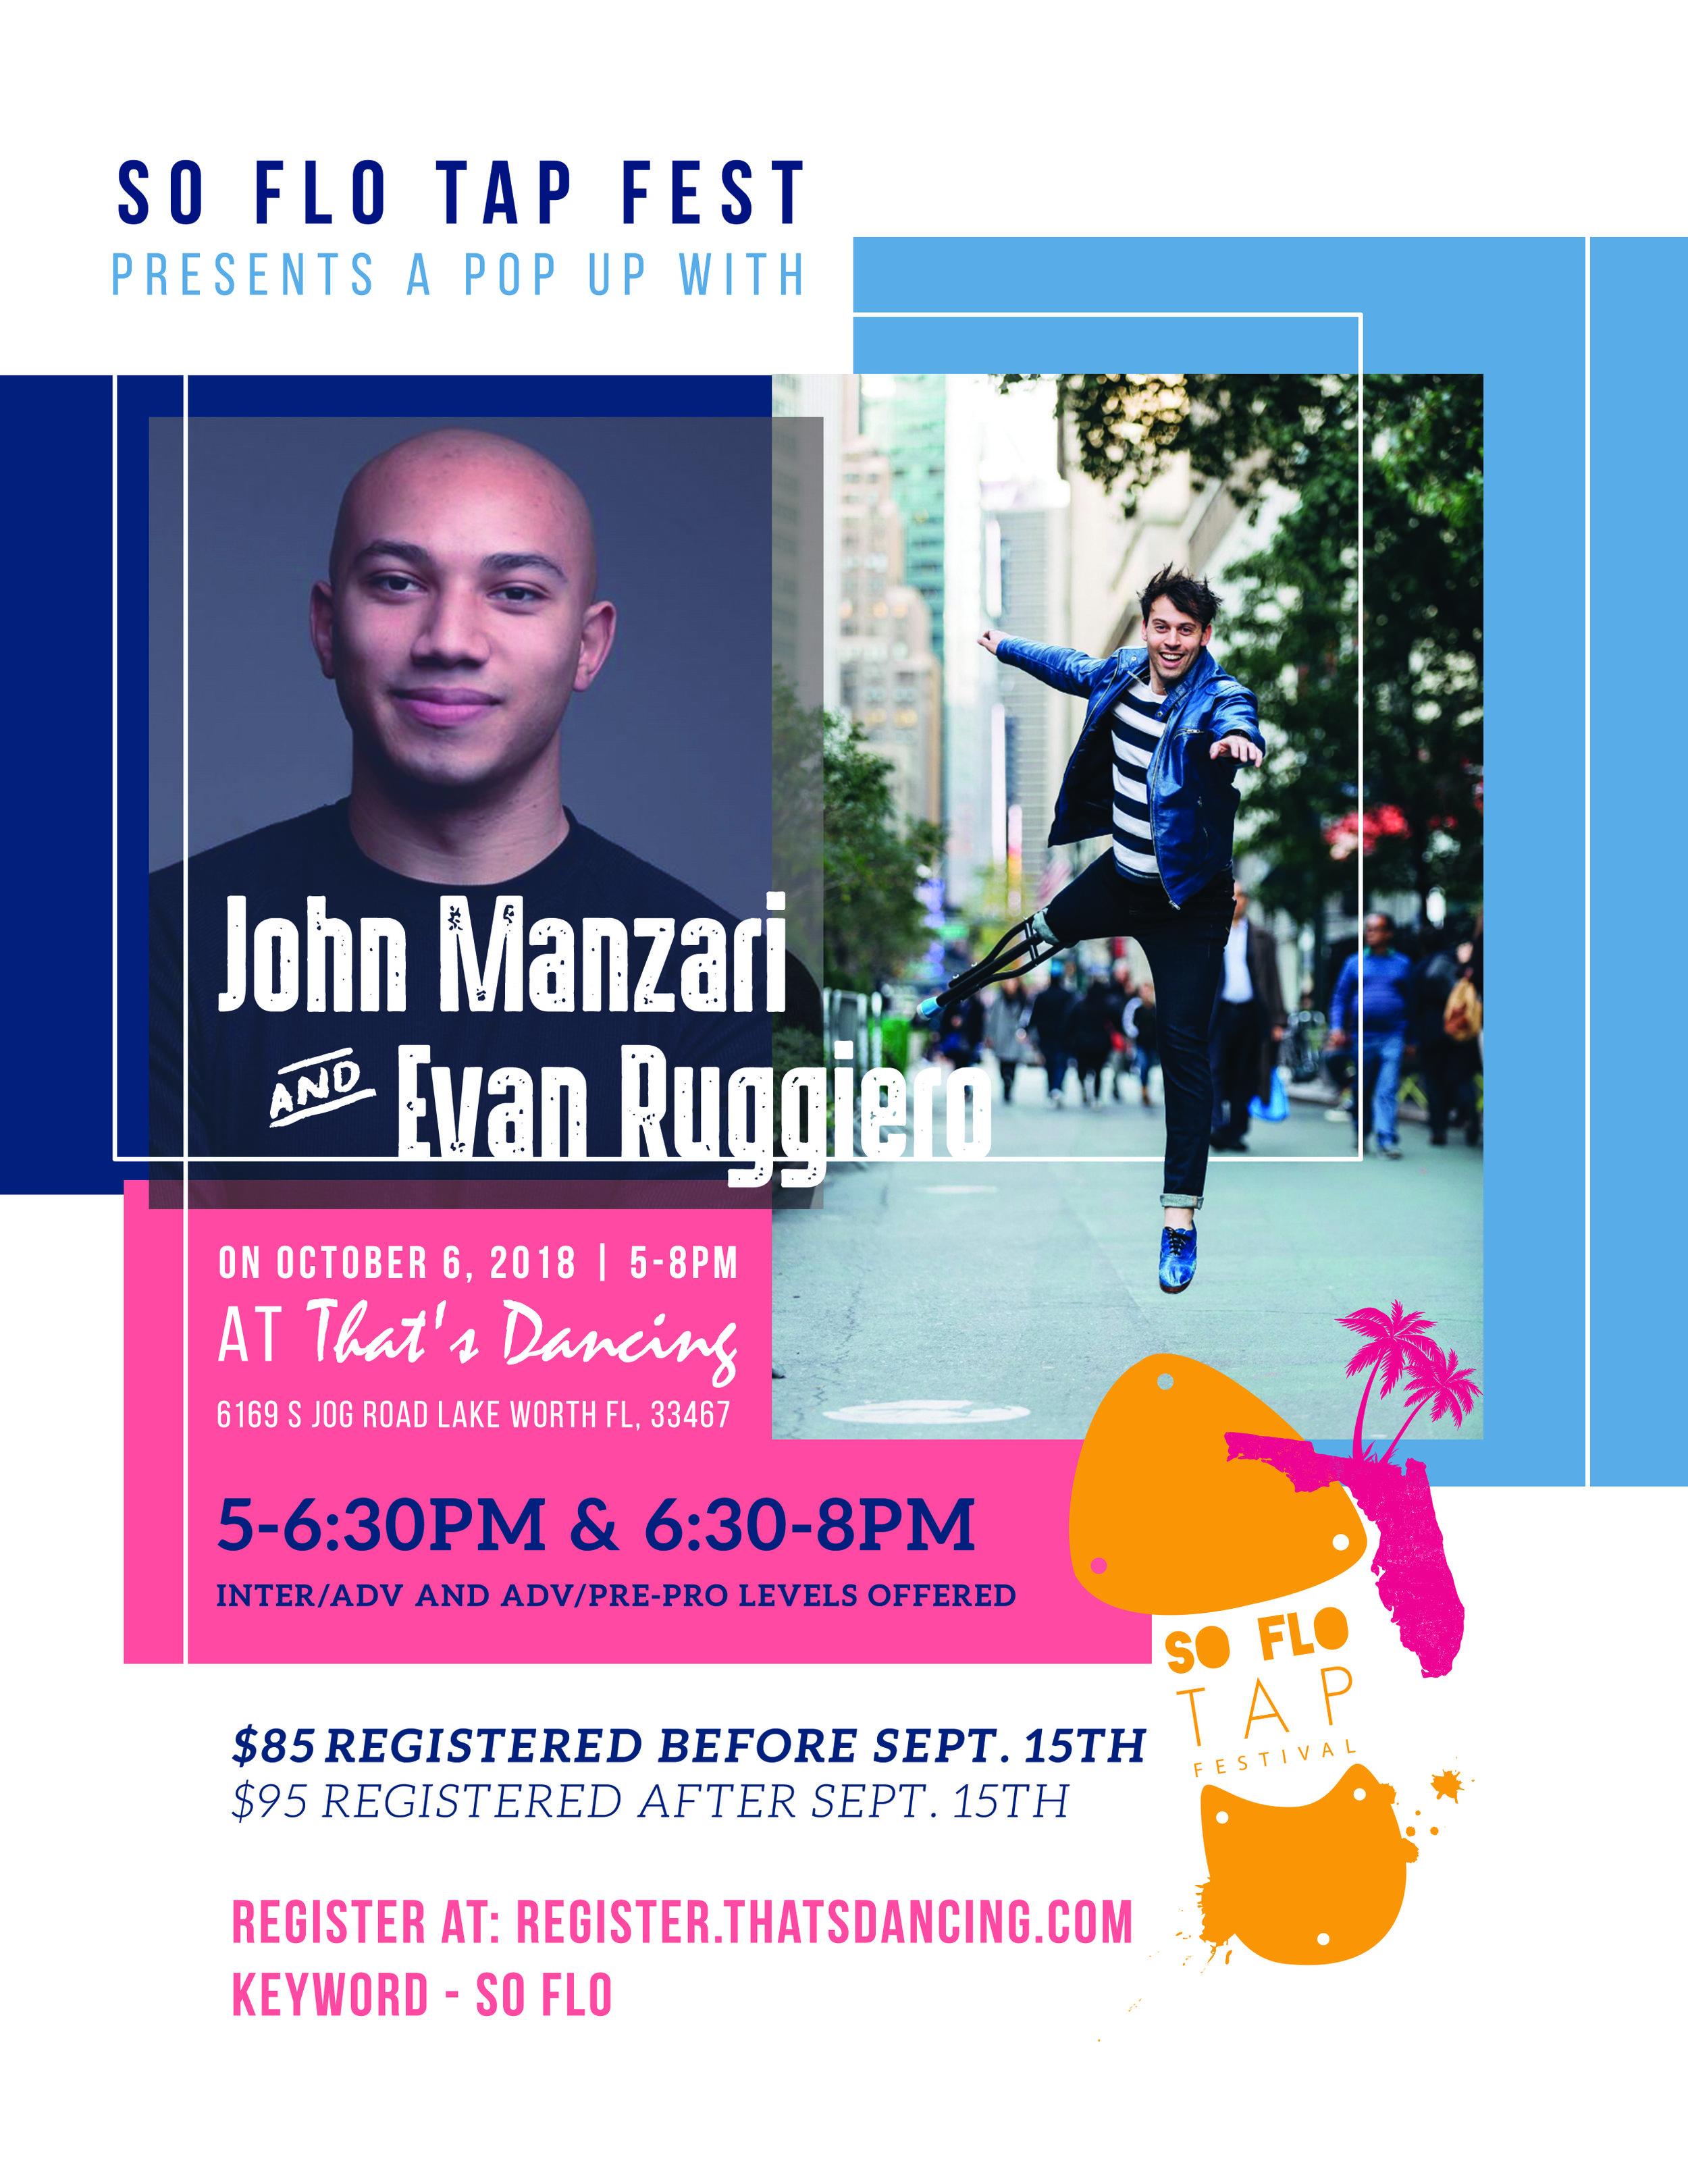 So Flo Tap Fest Presents    A Pop Up with John Manzari & Evan Ruggiero  October 6, 2018 5:00-8:00pm